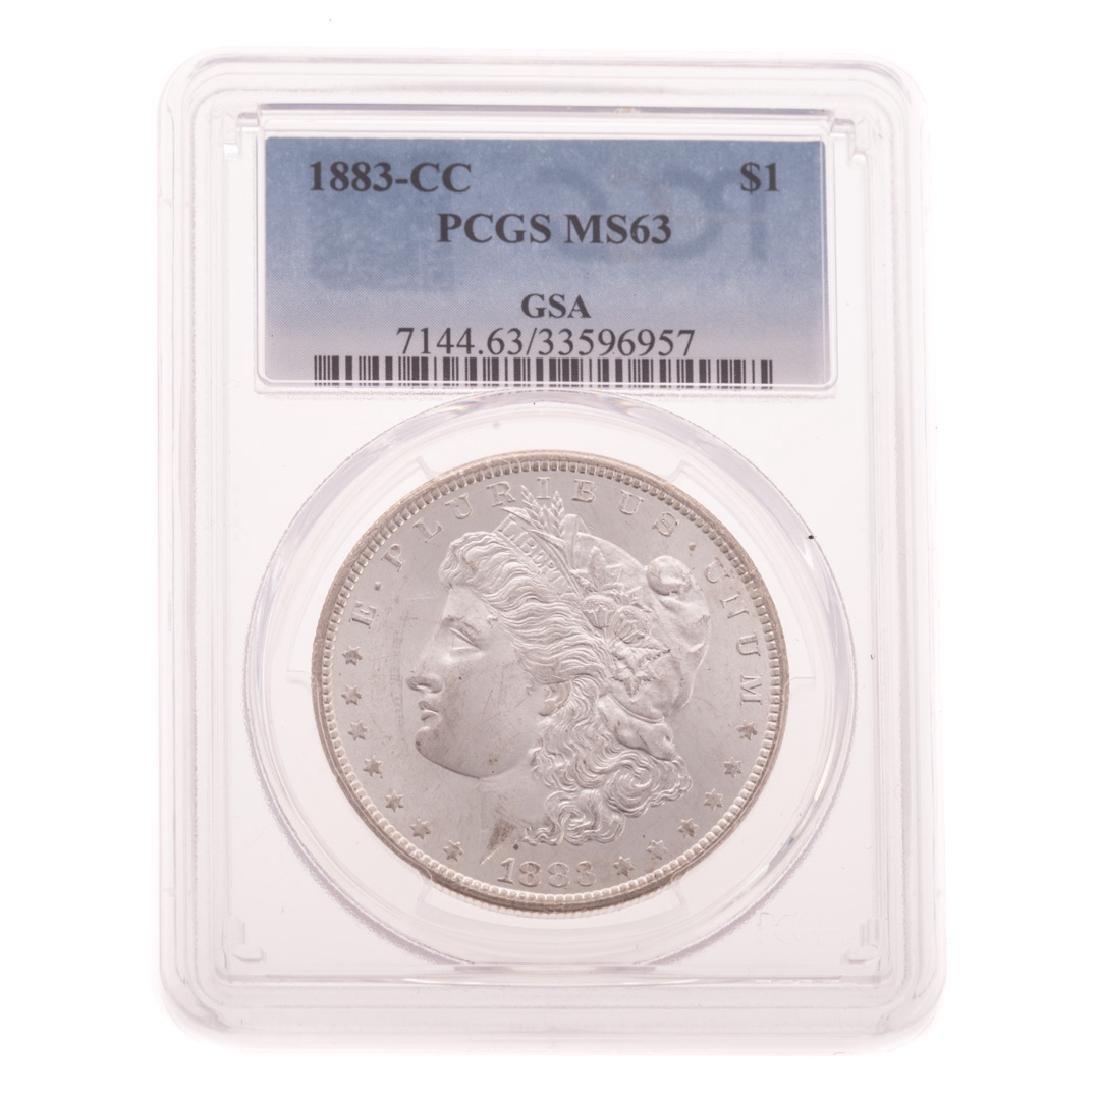 "[US] 1883-CC PCGS MS63 Morgan Dollar ""GSA"""